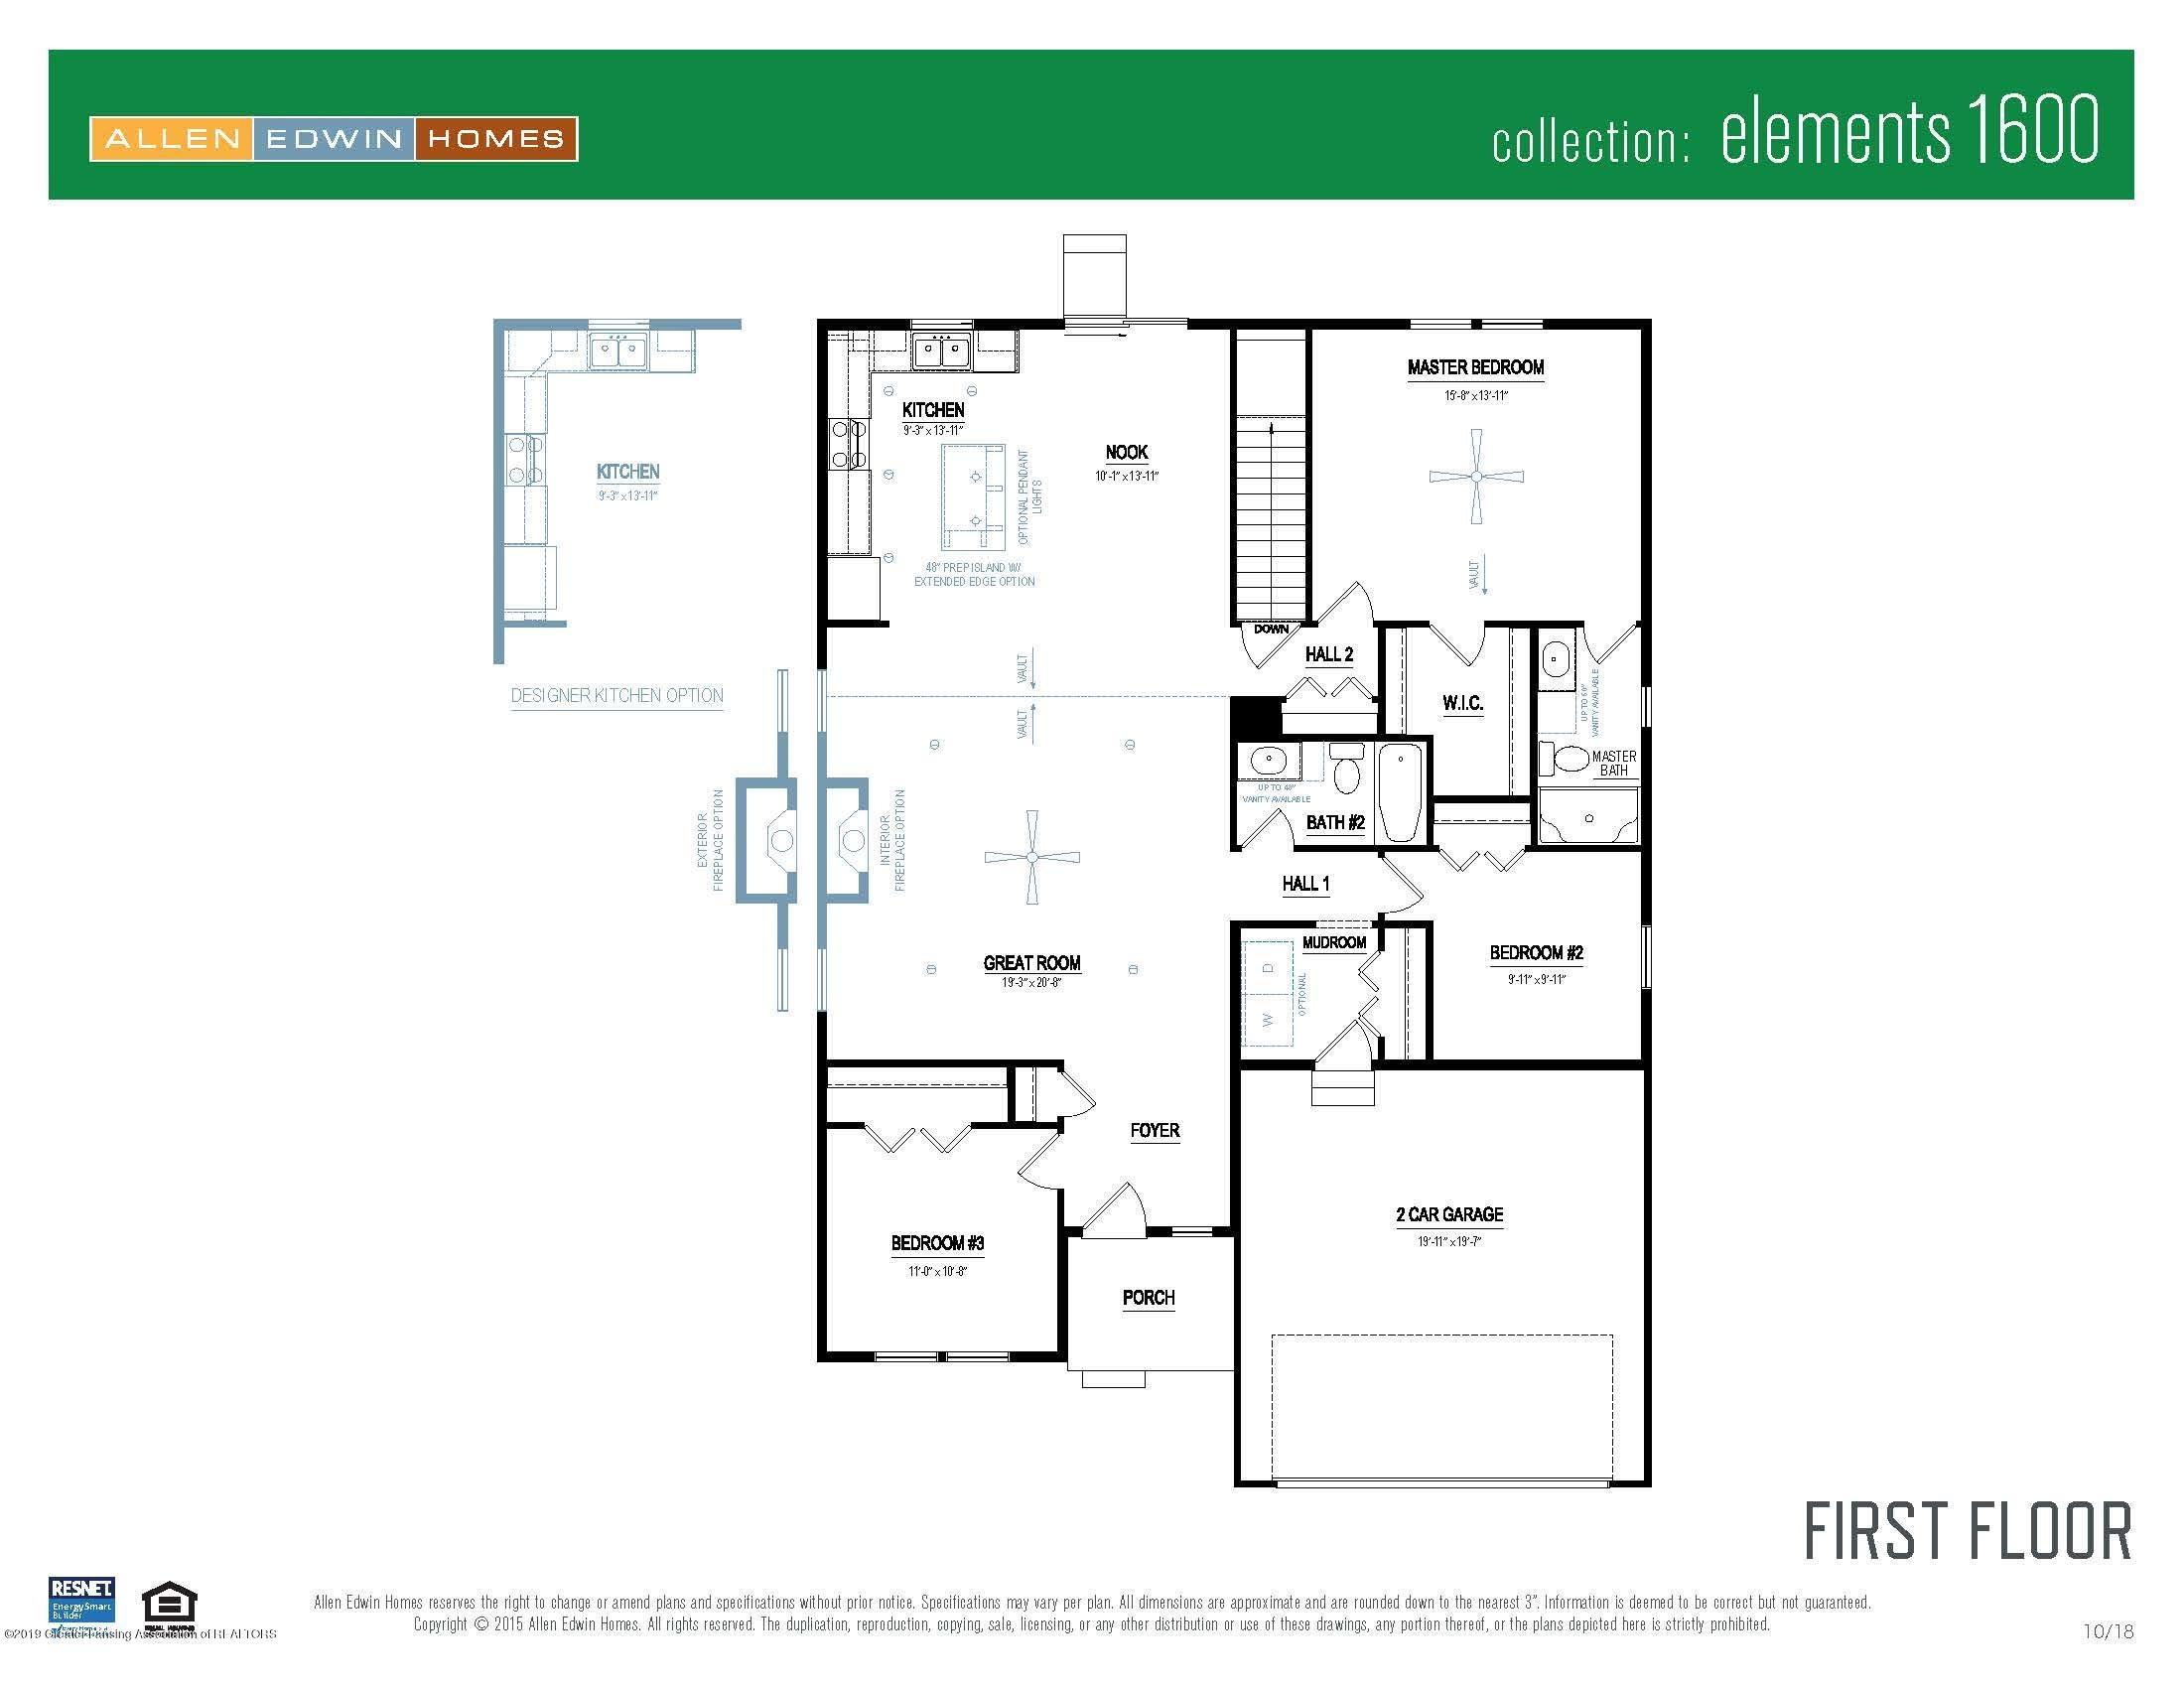 1009 Chesham - Elements 1600 V8.0a First Floor - 20